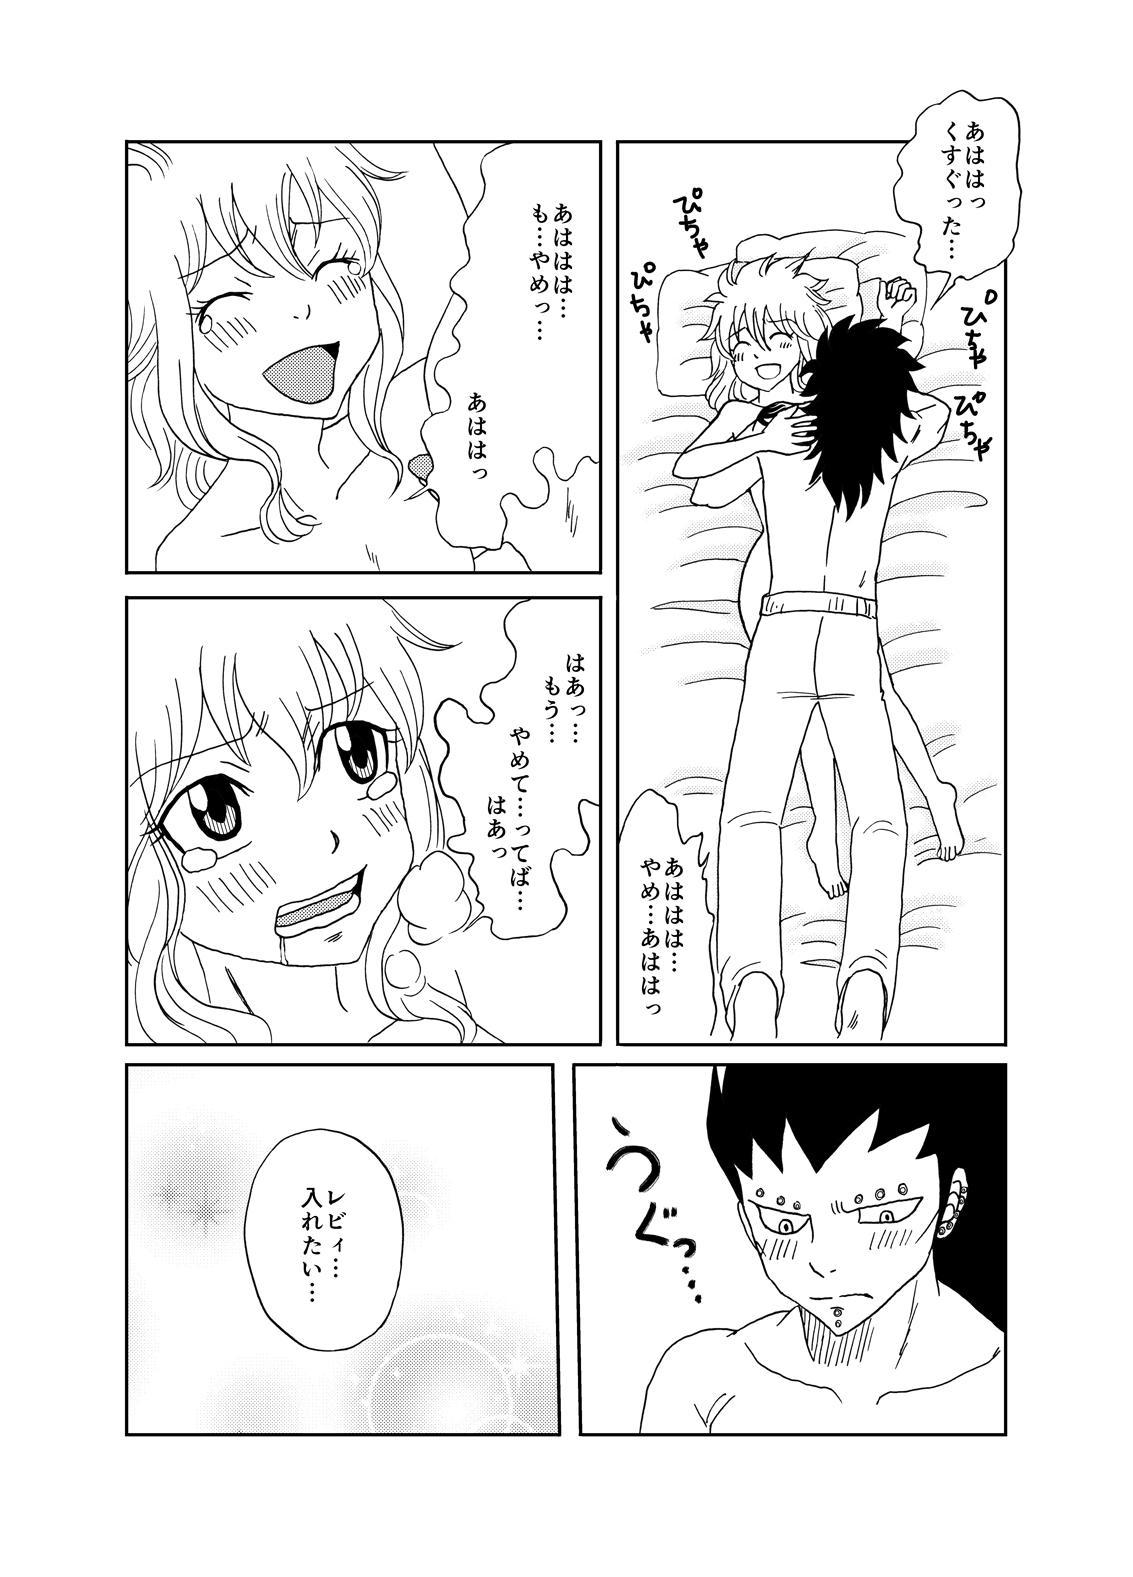 [Cashew] GajeeLevy Manga - Levy-chan ni Gohoushi (Fairy Tail) 12